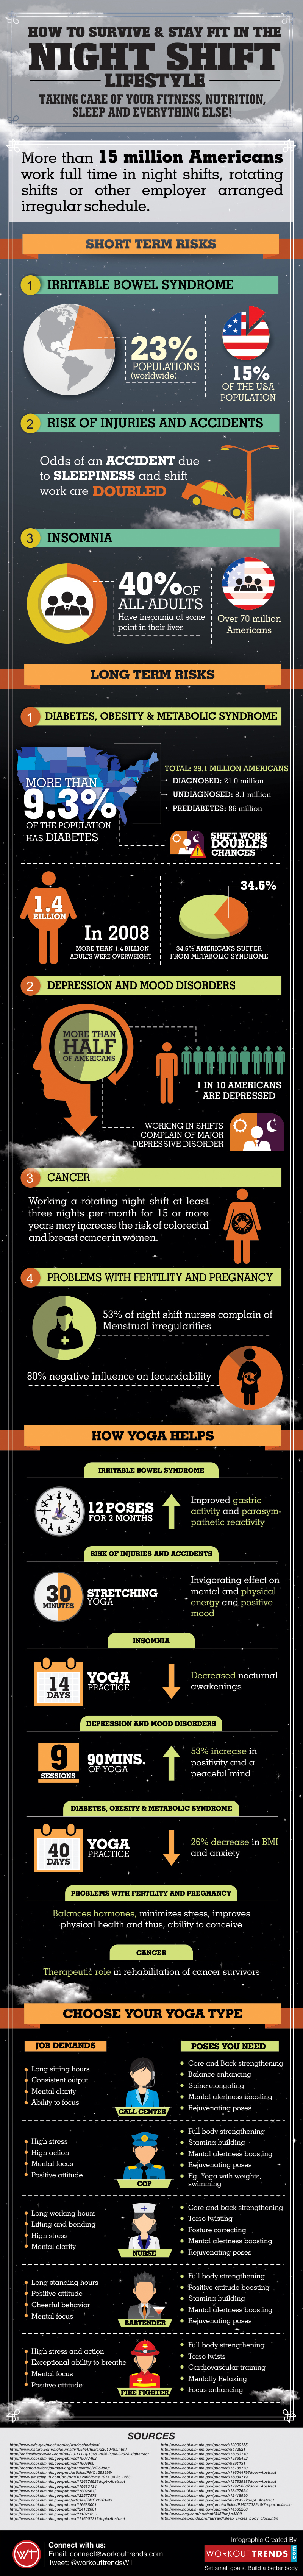 night shift lifestyle optimization tips techniques hacks yoga